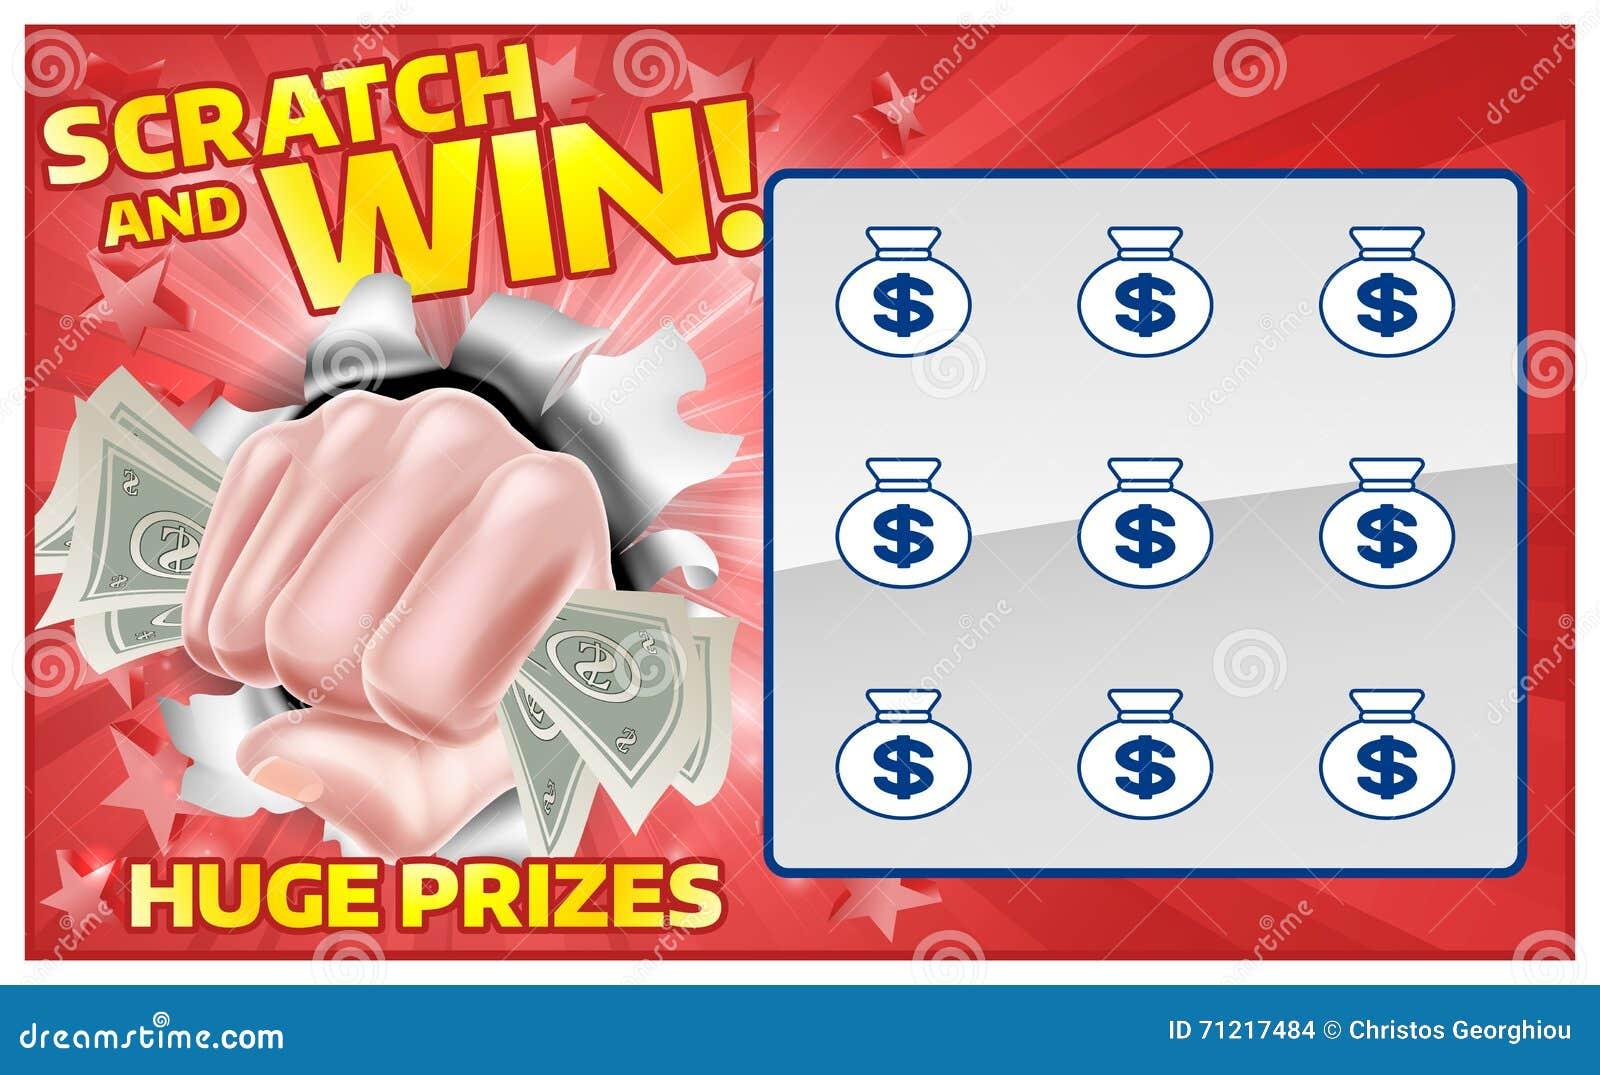 Cash in Hand - 155673